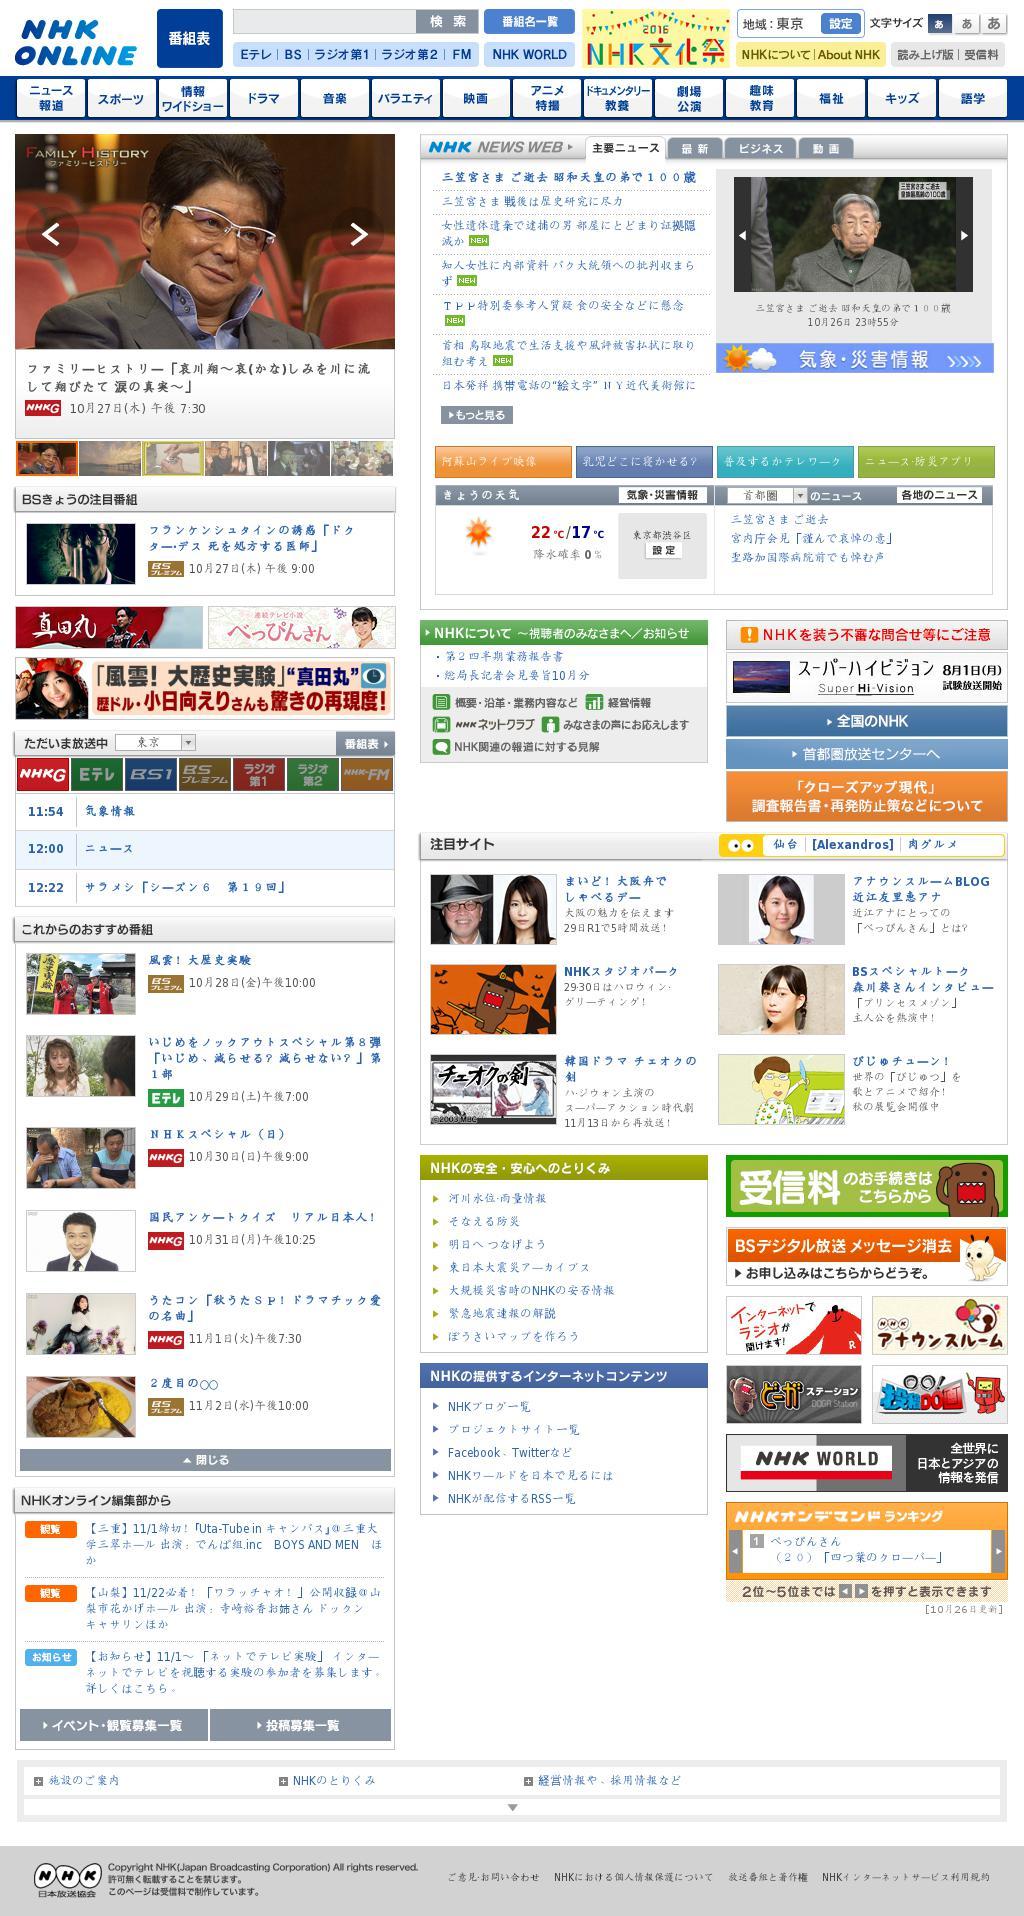 NHK Online at Thursday Oct. 27, 2016, 3:14 a.m. UTC